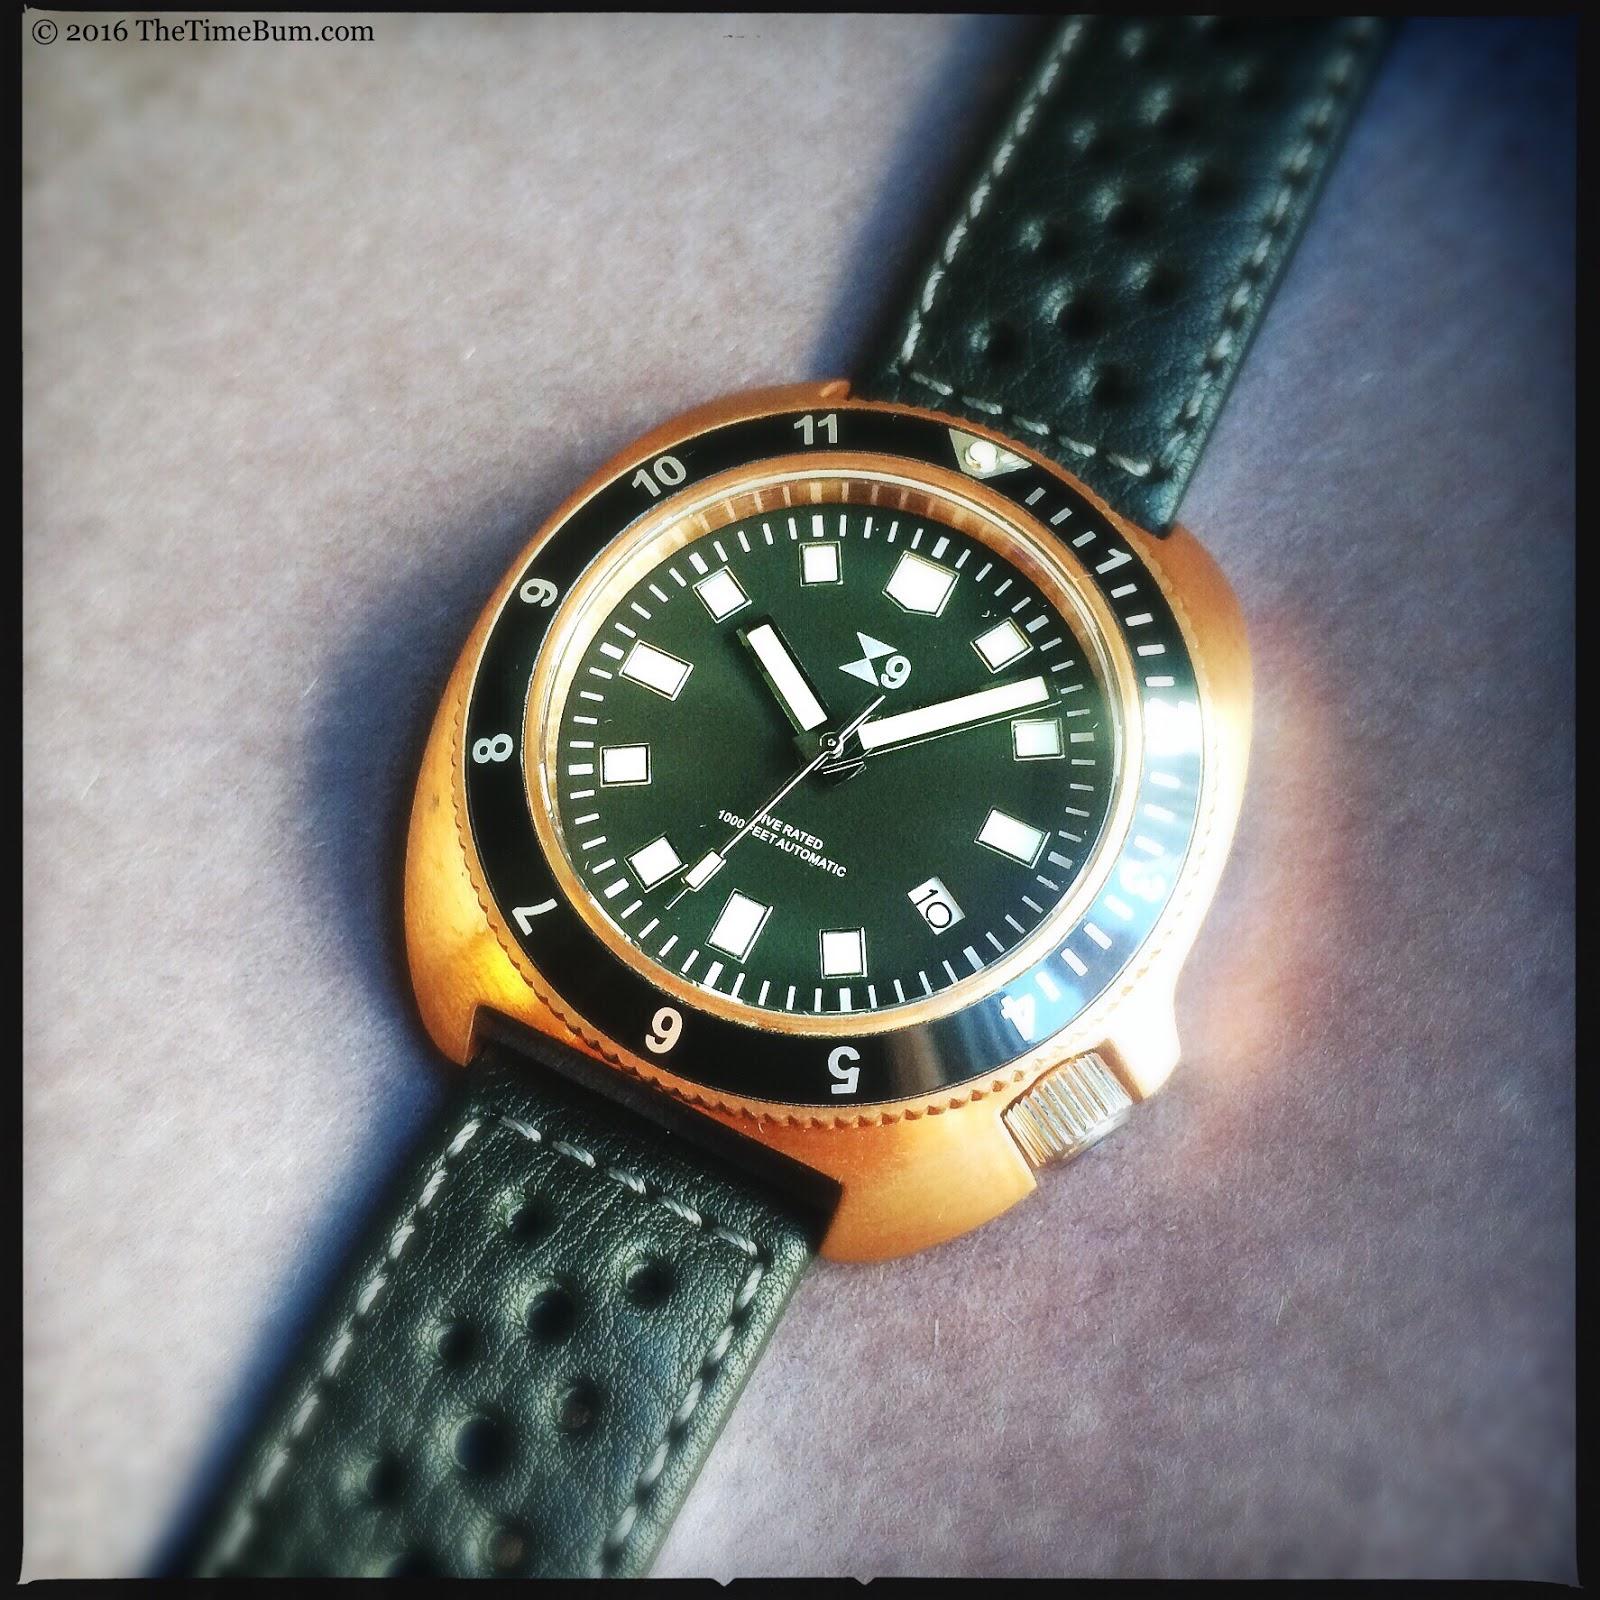 Tc 9 bronze 1970 39 s diver and brass pilot the time bum - Bronze dive watch ...